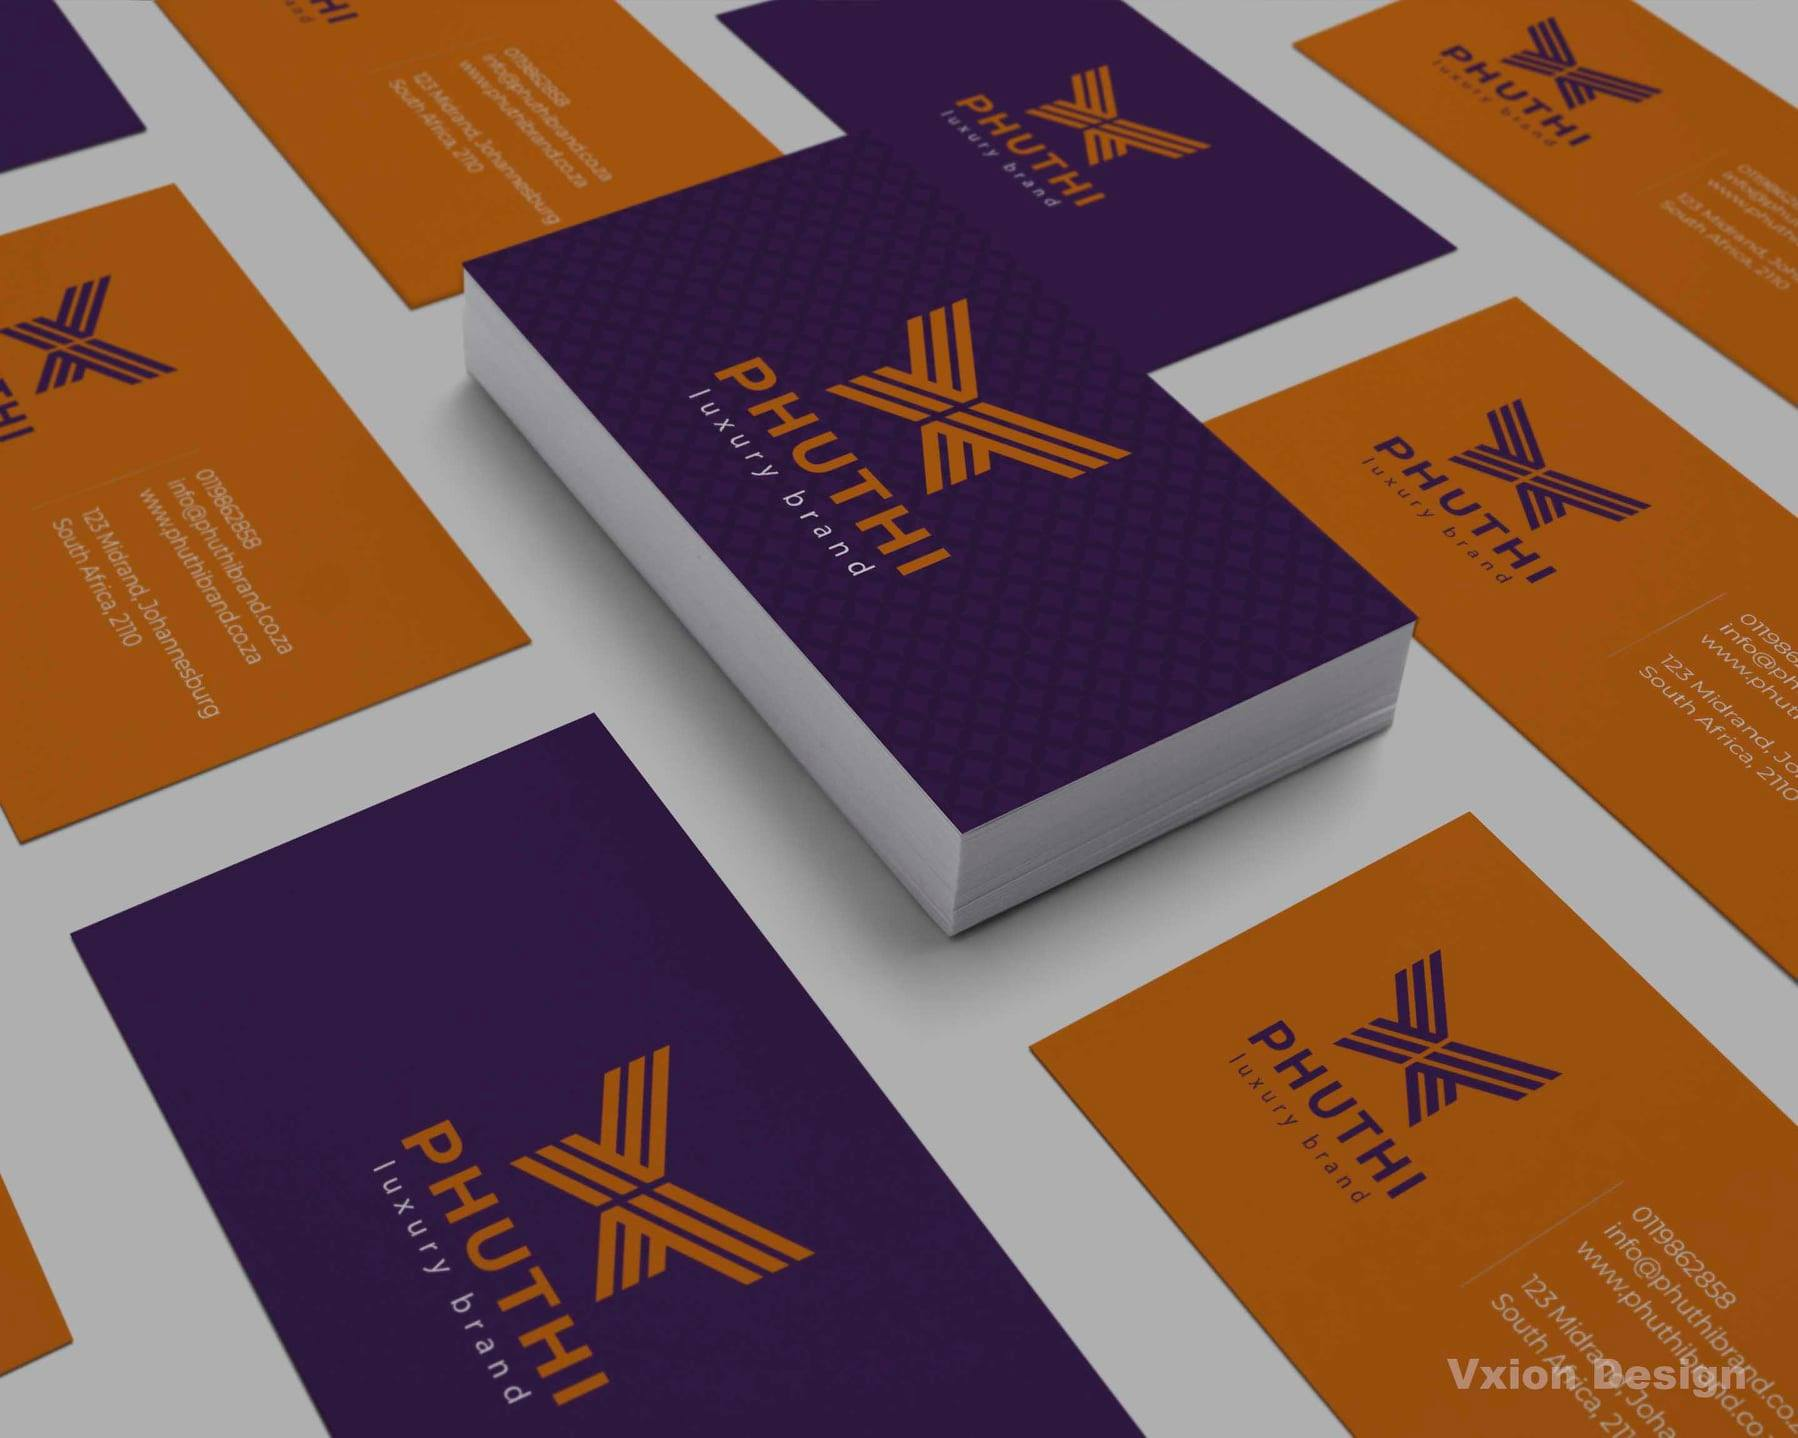 website design-graphic design material-Digital Marketing